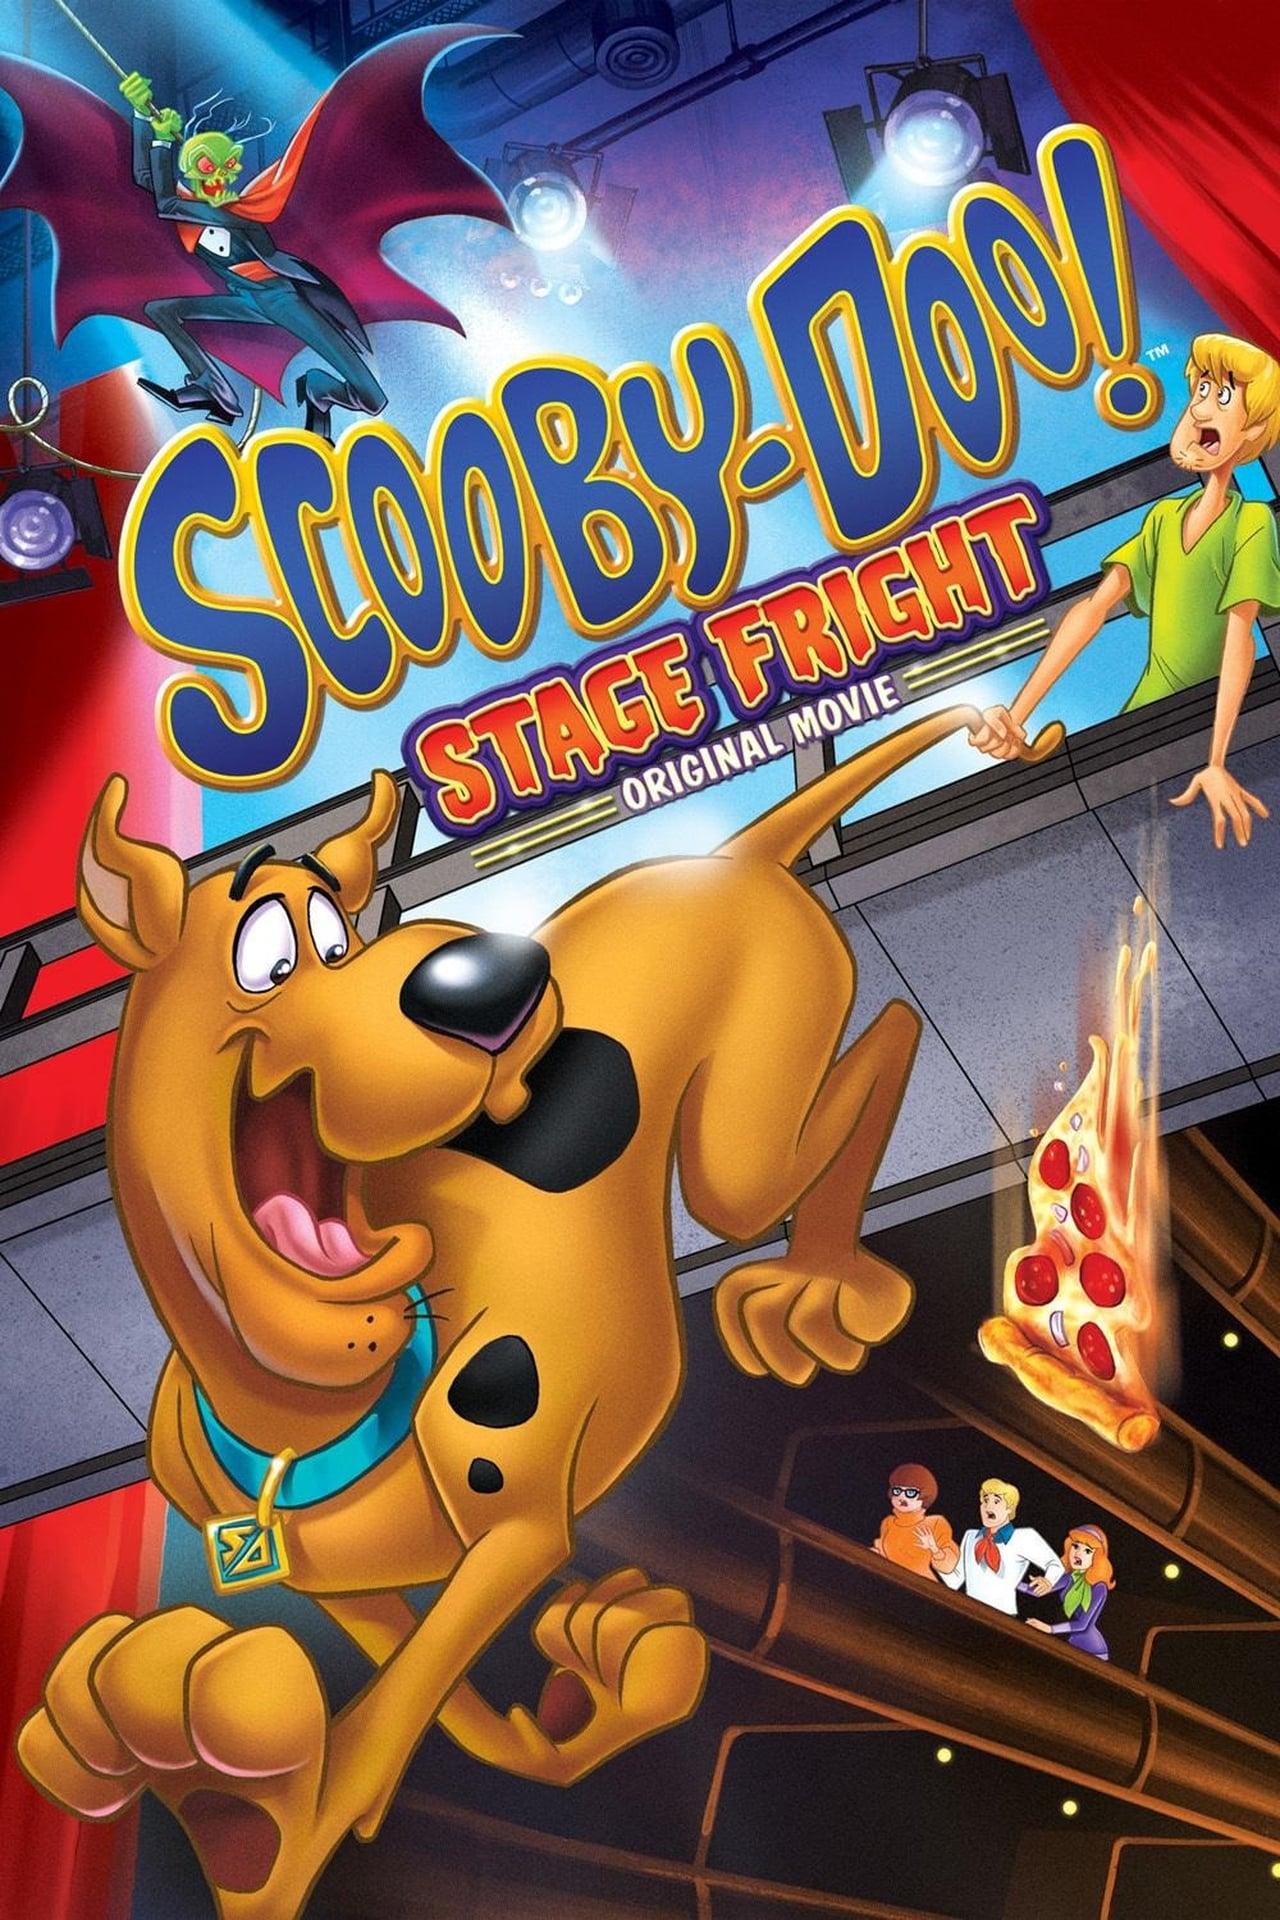 Scooby Doo Besetzung